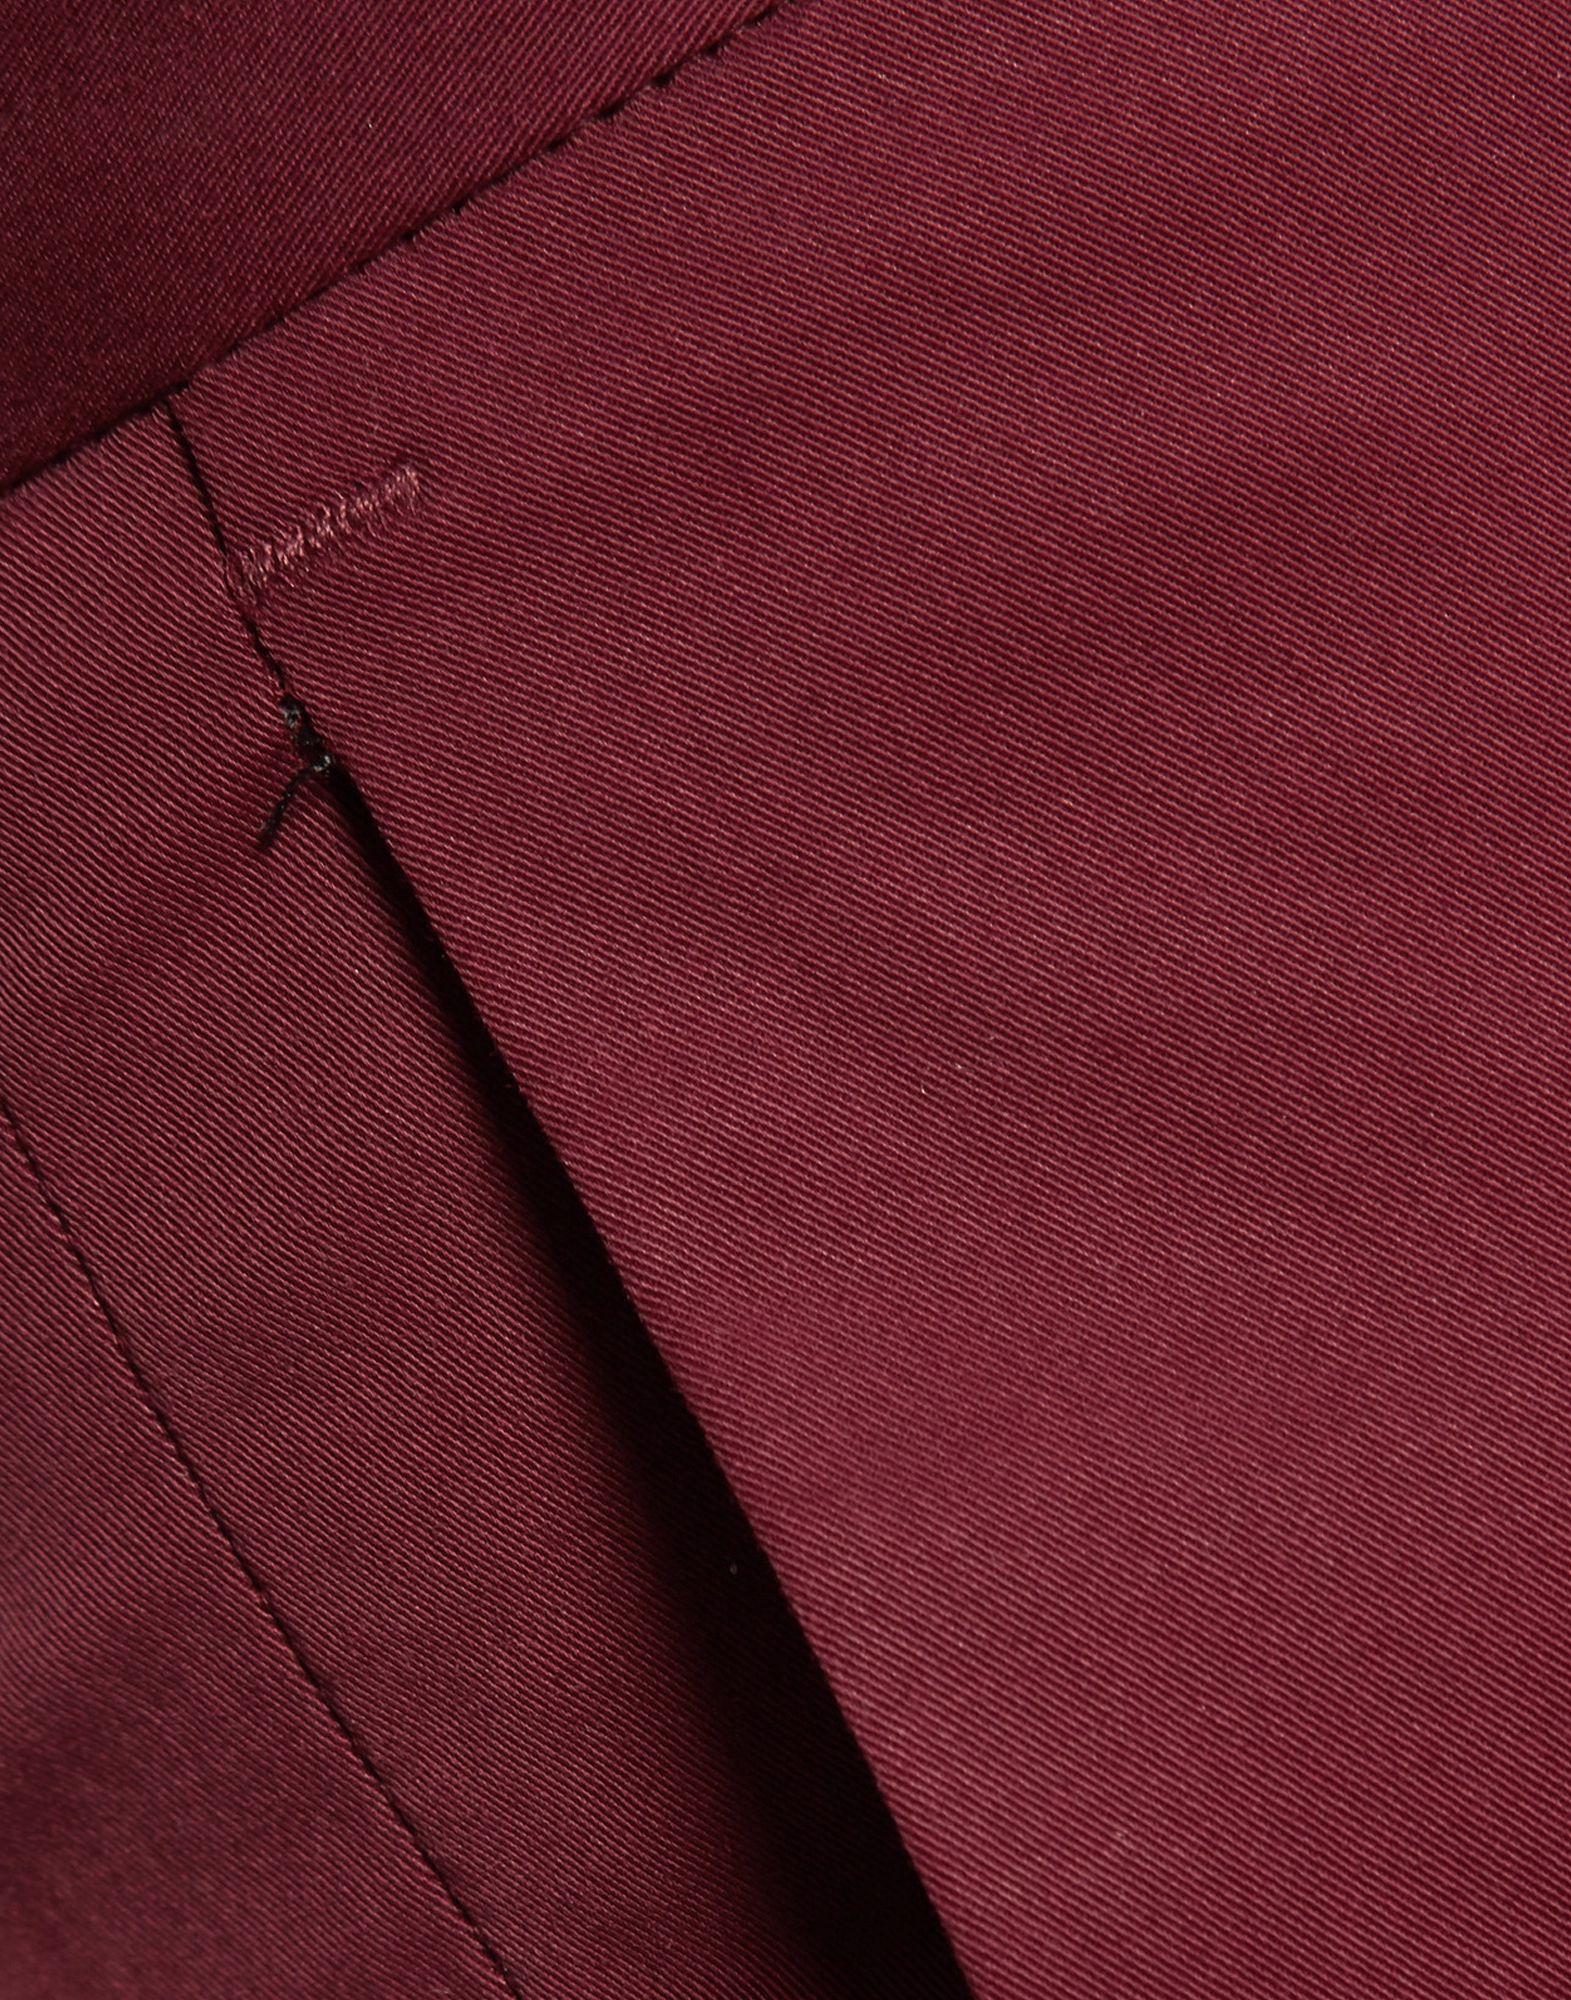 Joseph Maroon Cotton Chino Trousers